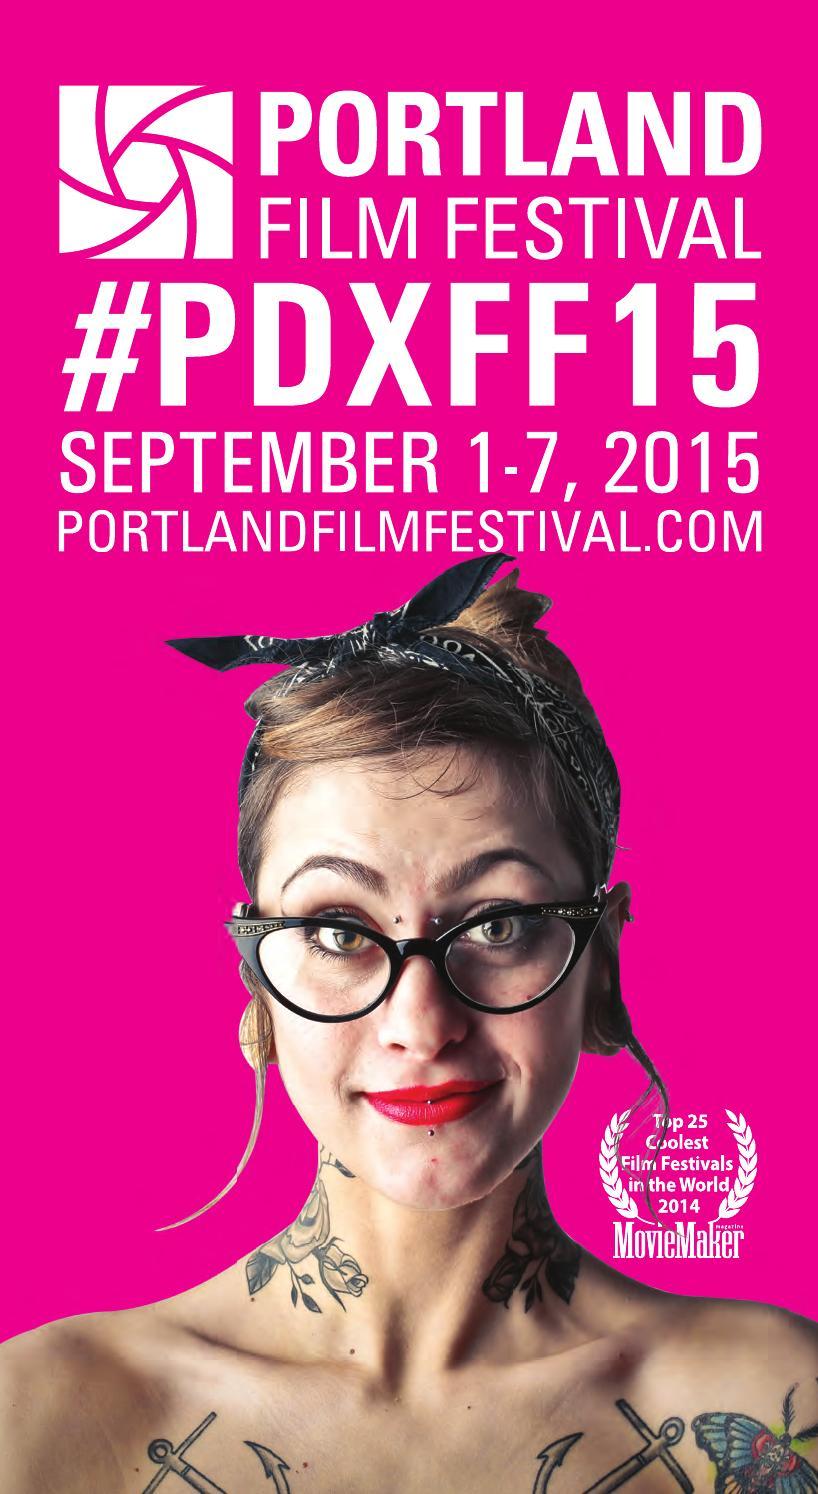 2015 Portland Film Festival Program #PDXFF15 by Portland Film ...